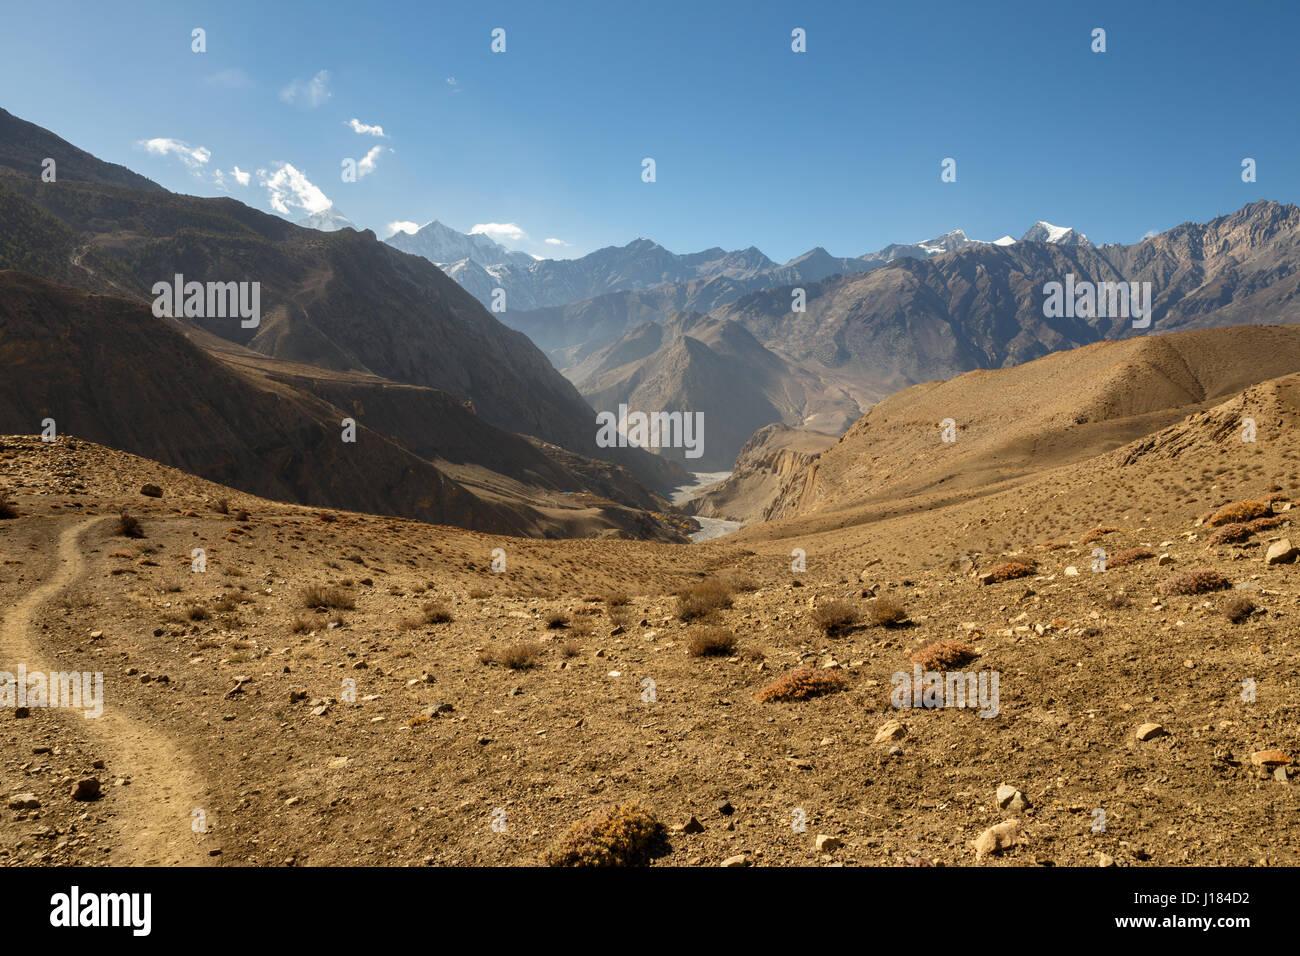 Himalaya mountains, Nepal. - Stock Image